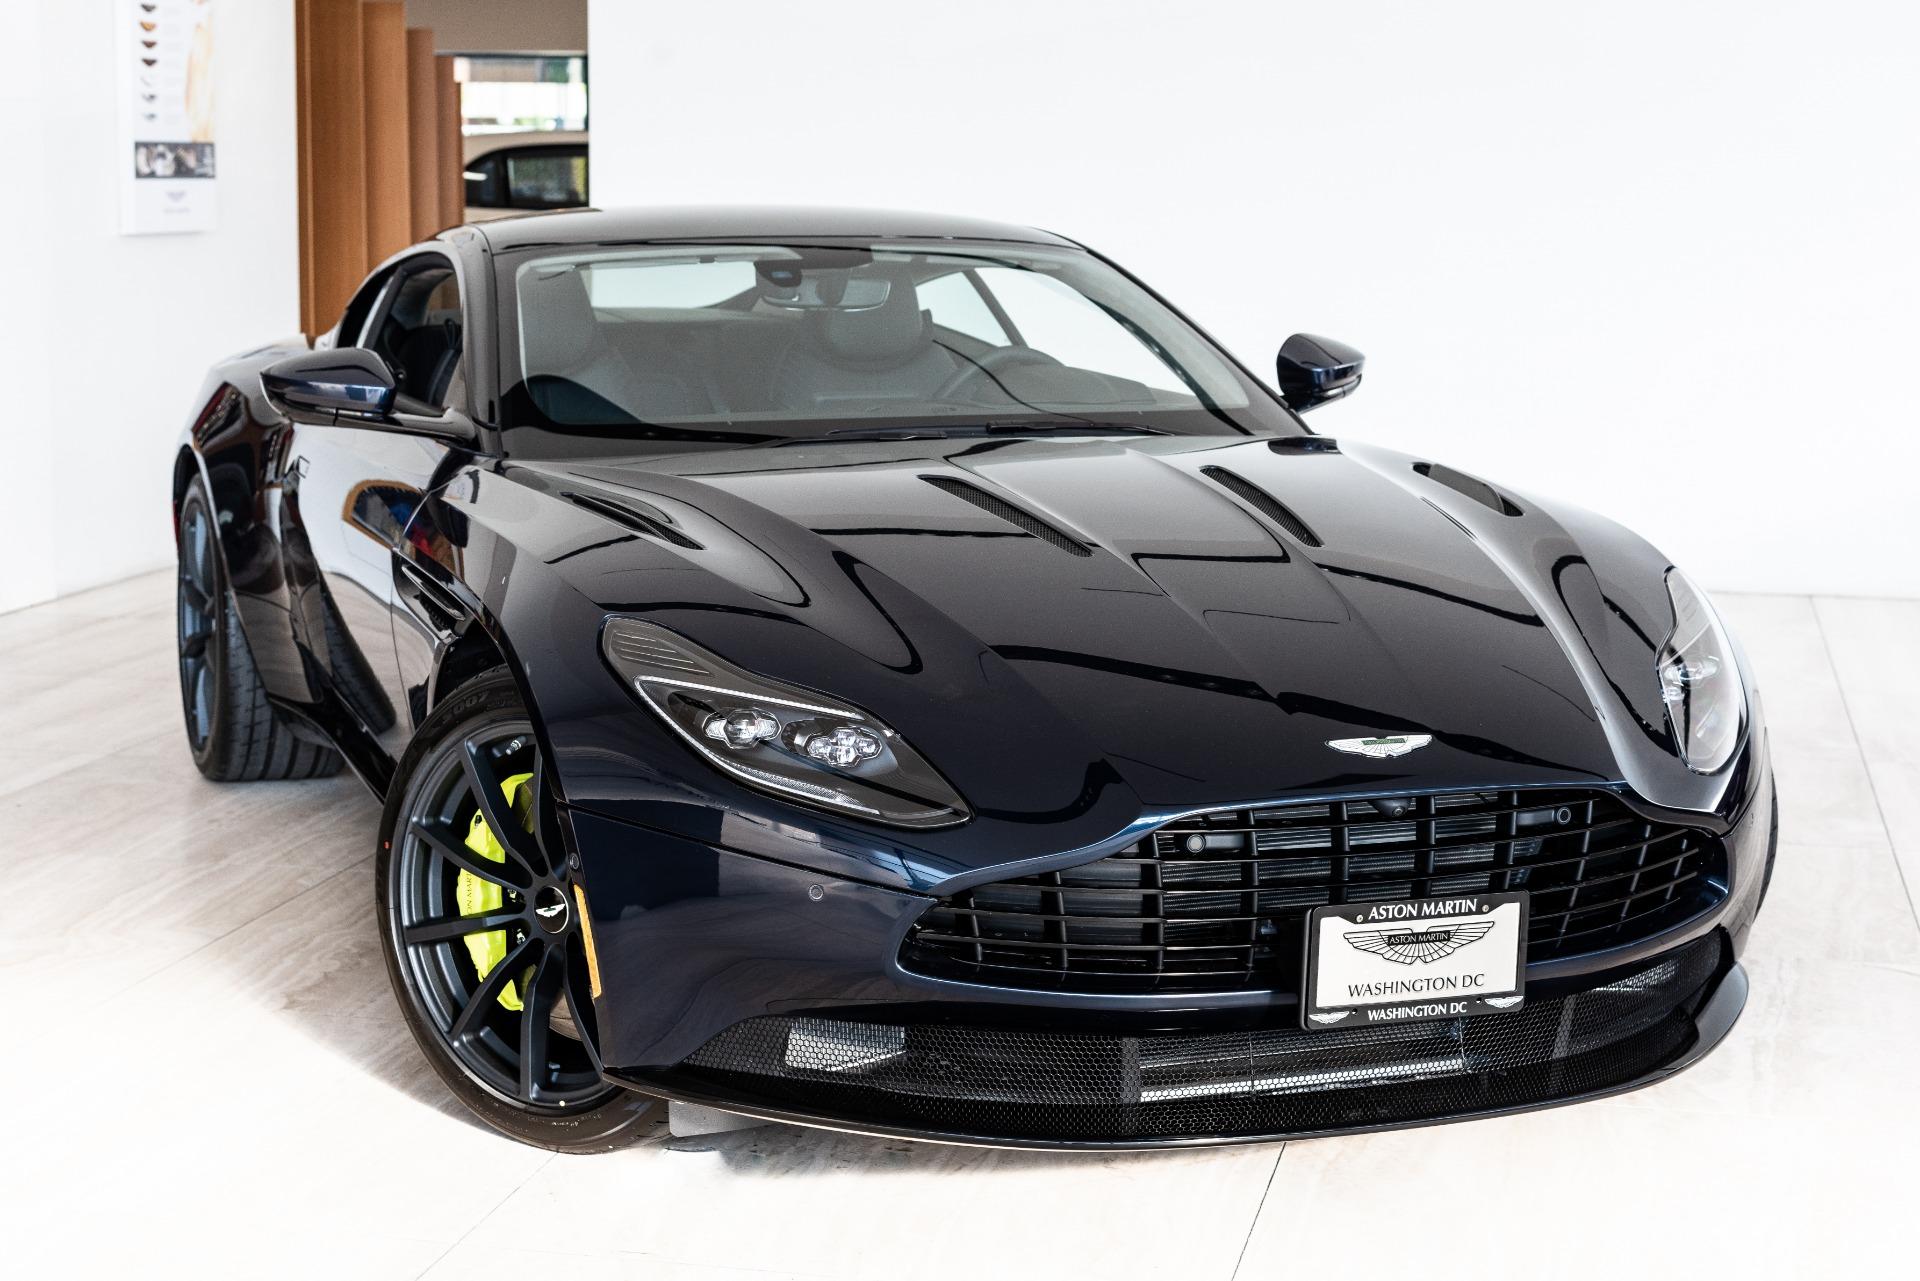 Aston Martin Stock >> 2019 Aston Martin Db11 Amr Stock 9nl08277 For Sale Near